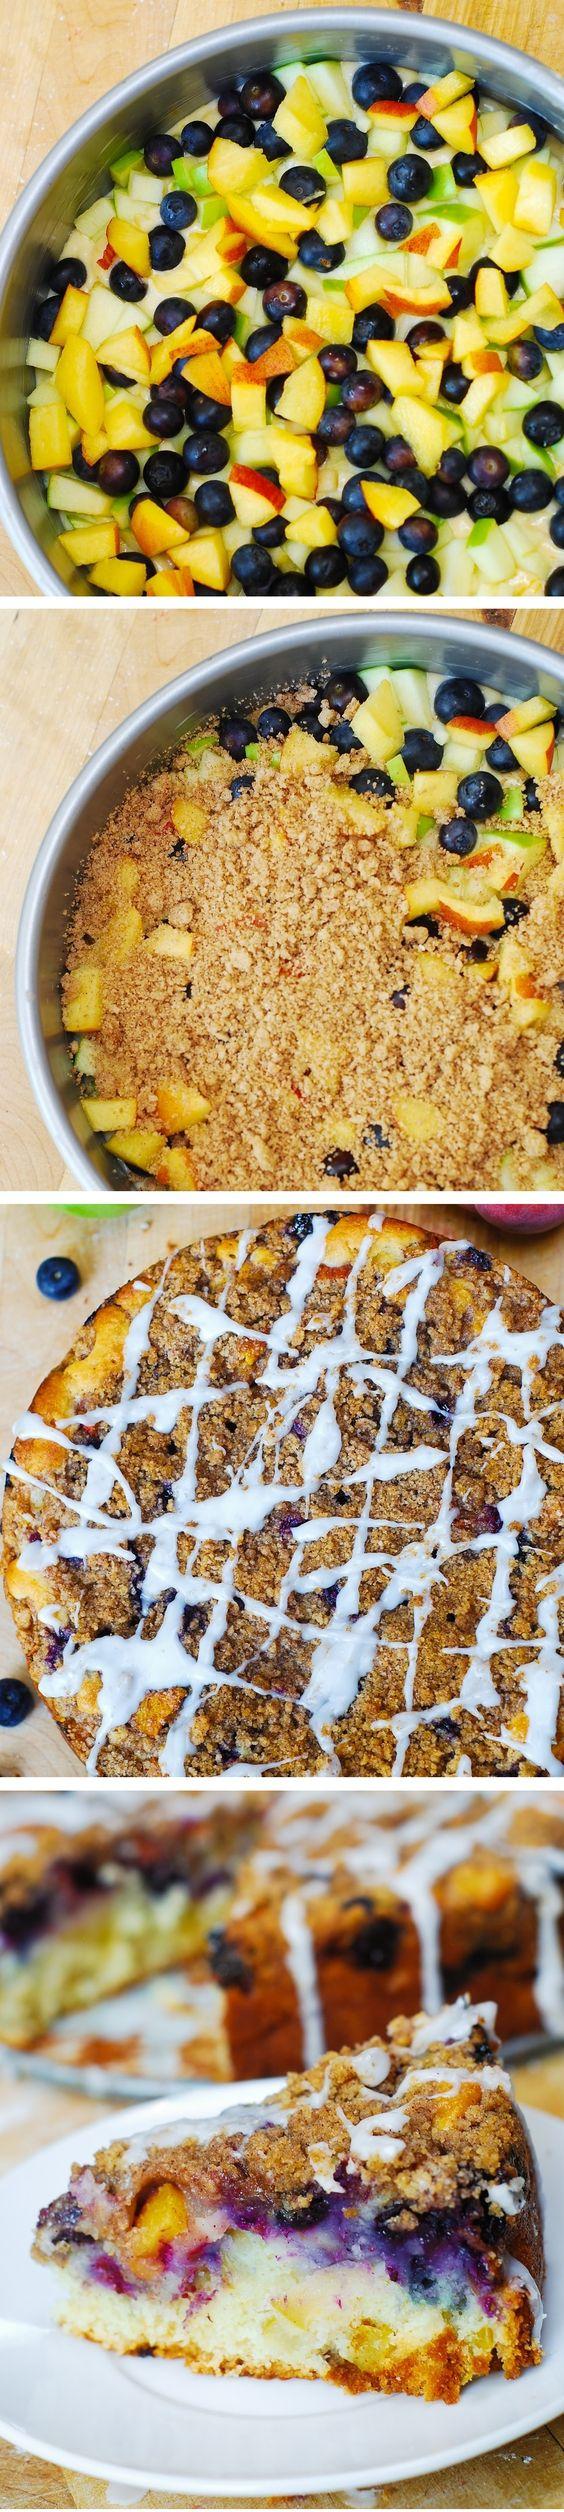 Apple, Blueberry, Peach Coffee Cake | Recipe | Coffee Cake ...